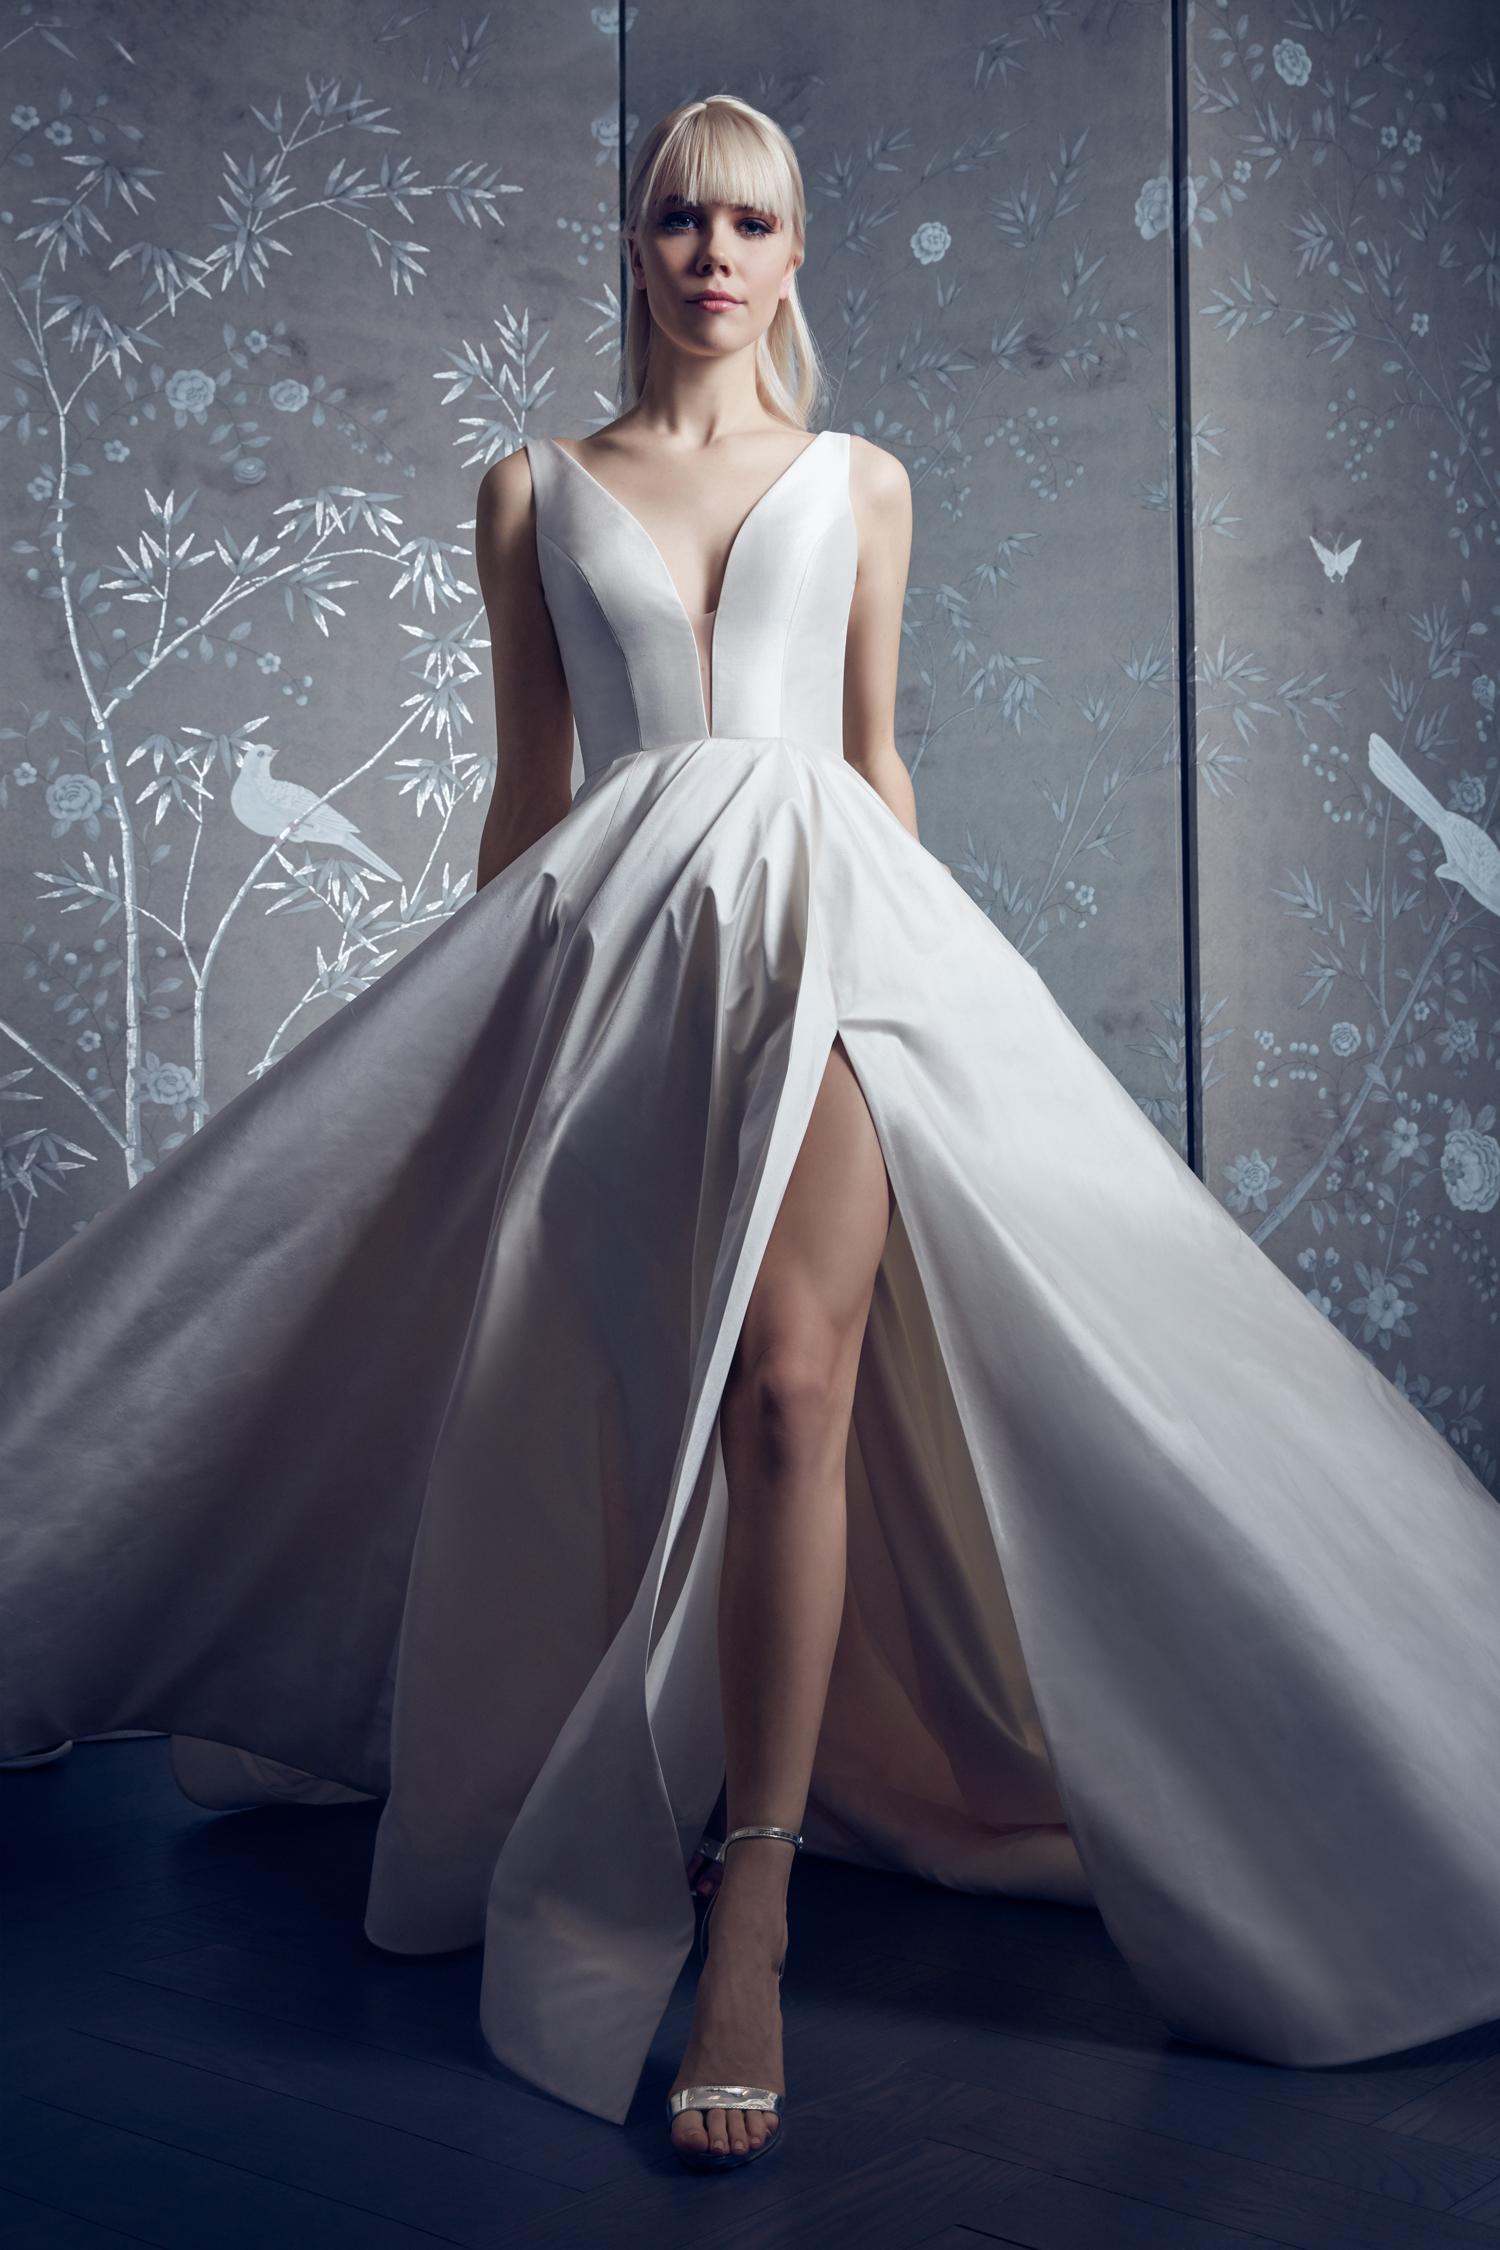 legends romona keveza plunging neckline ballgown wedding dress with leg slit spring 2020